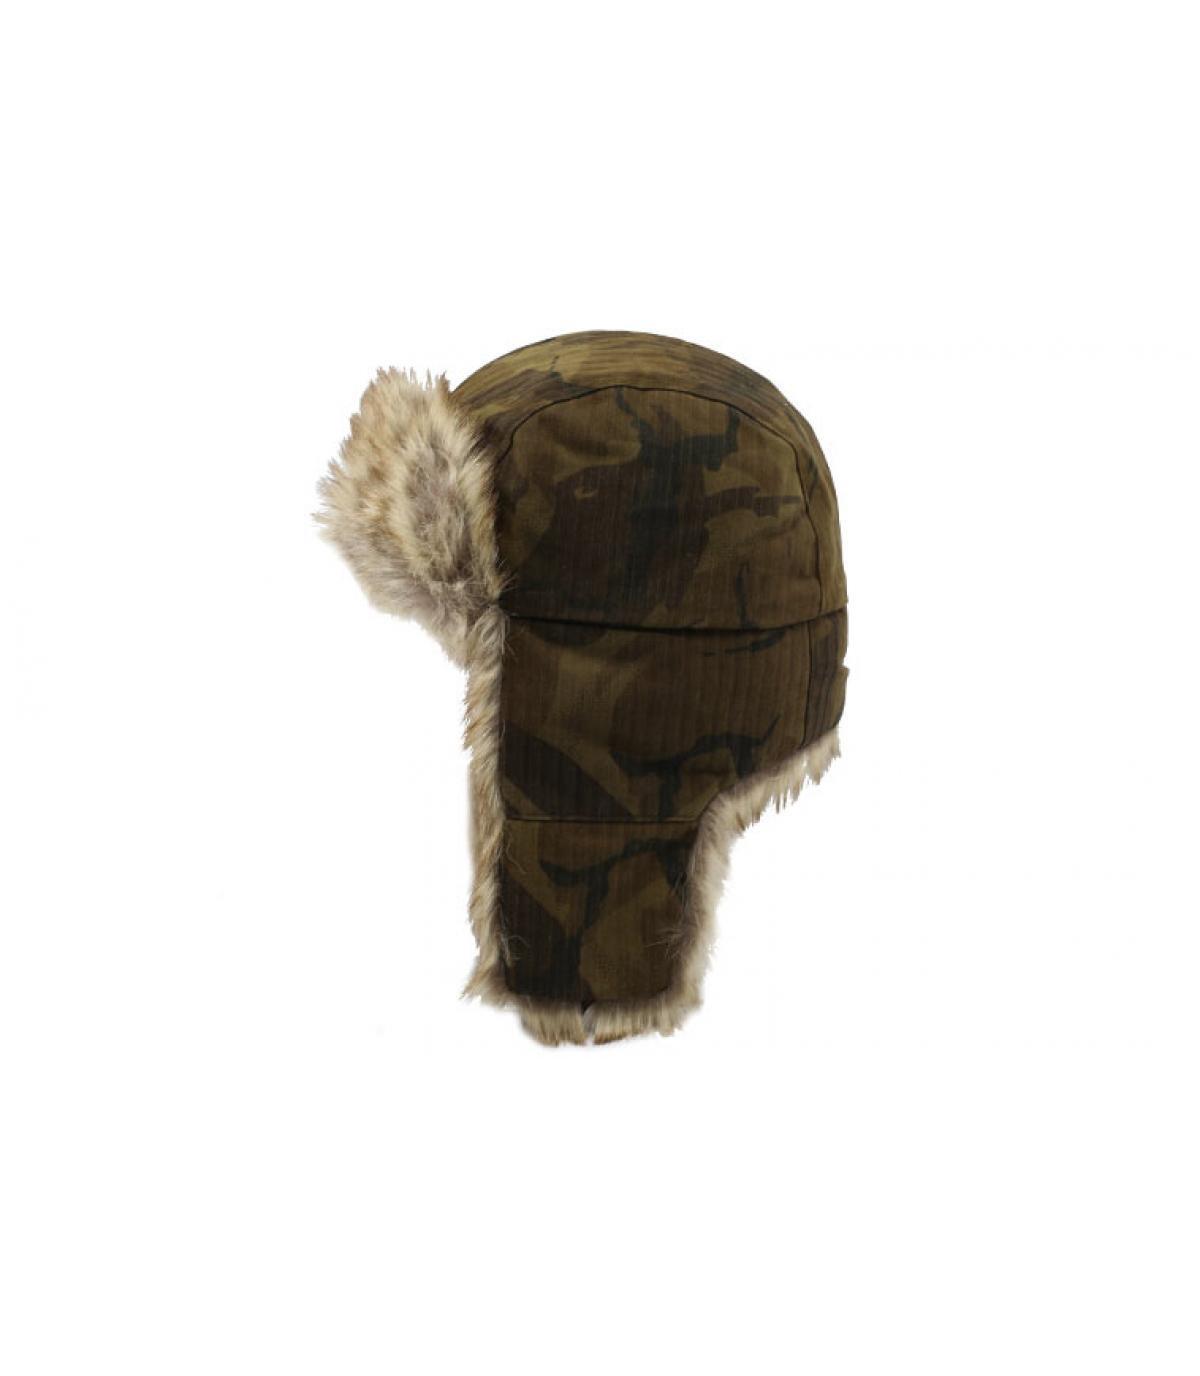 Details Bomber Cap Waxed Cotton Camouflage - Abbildung 2